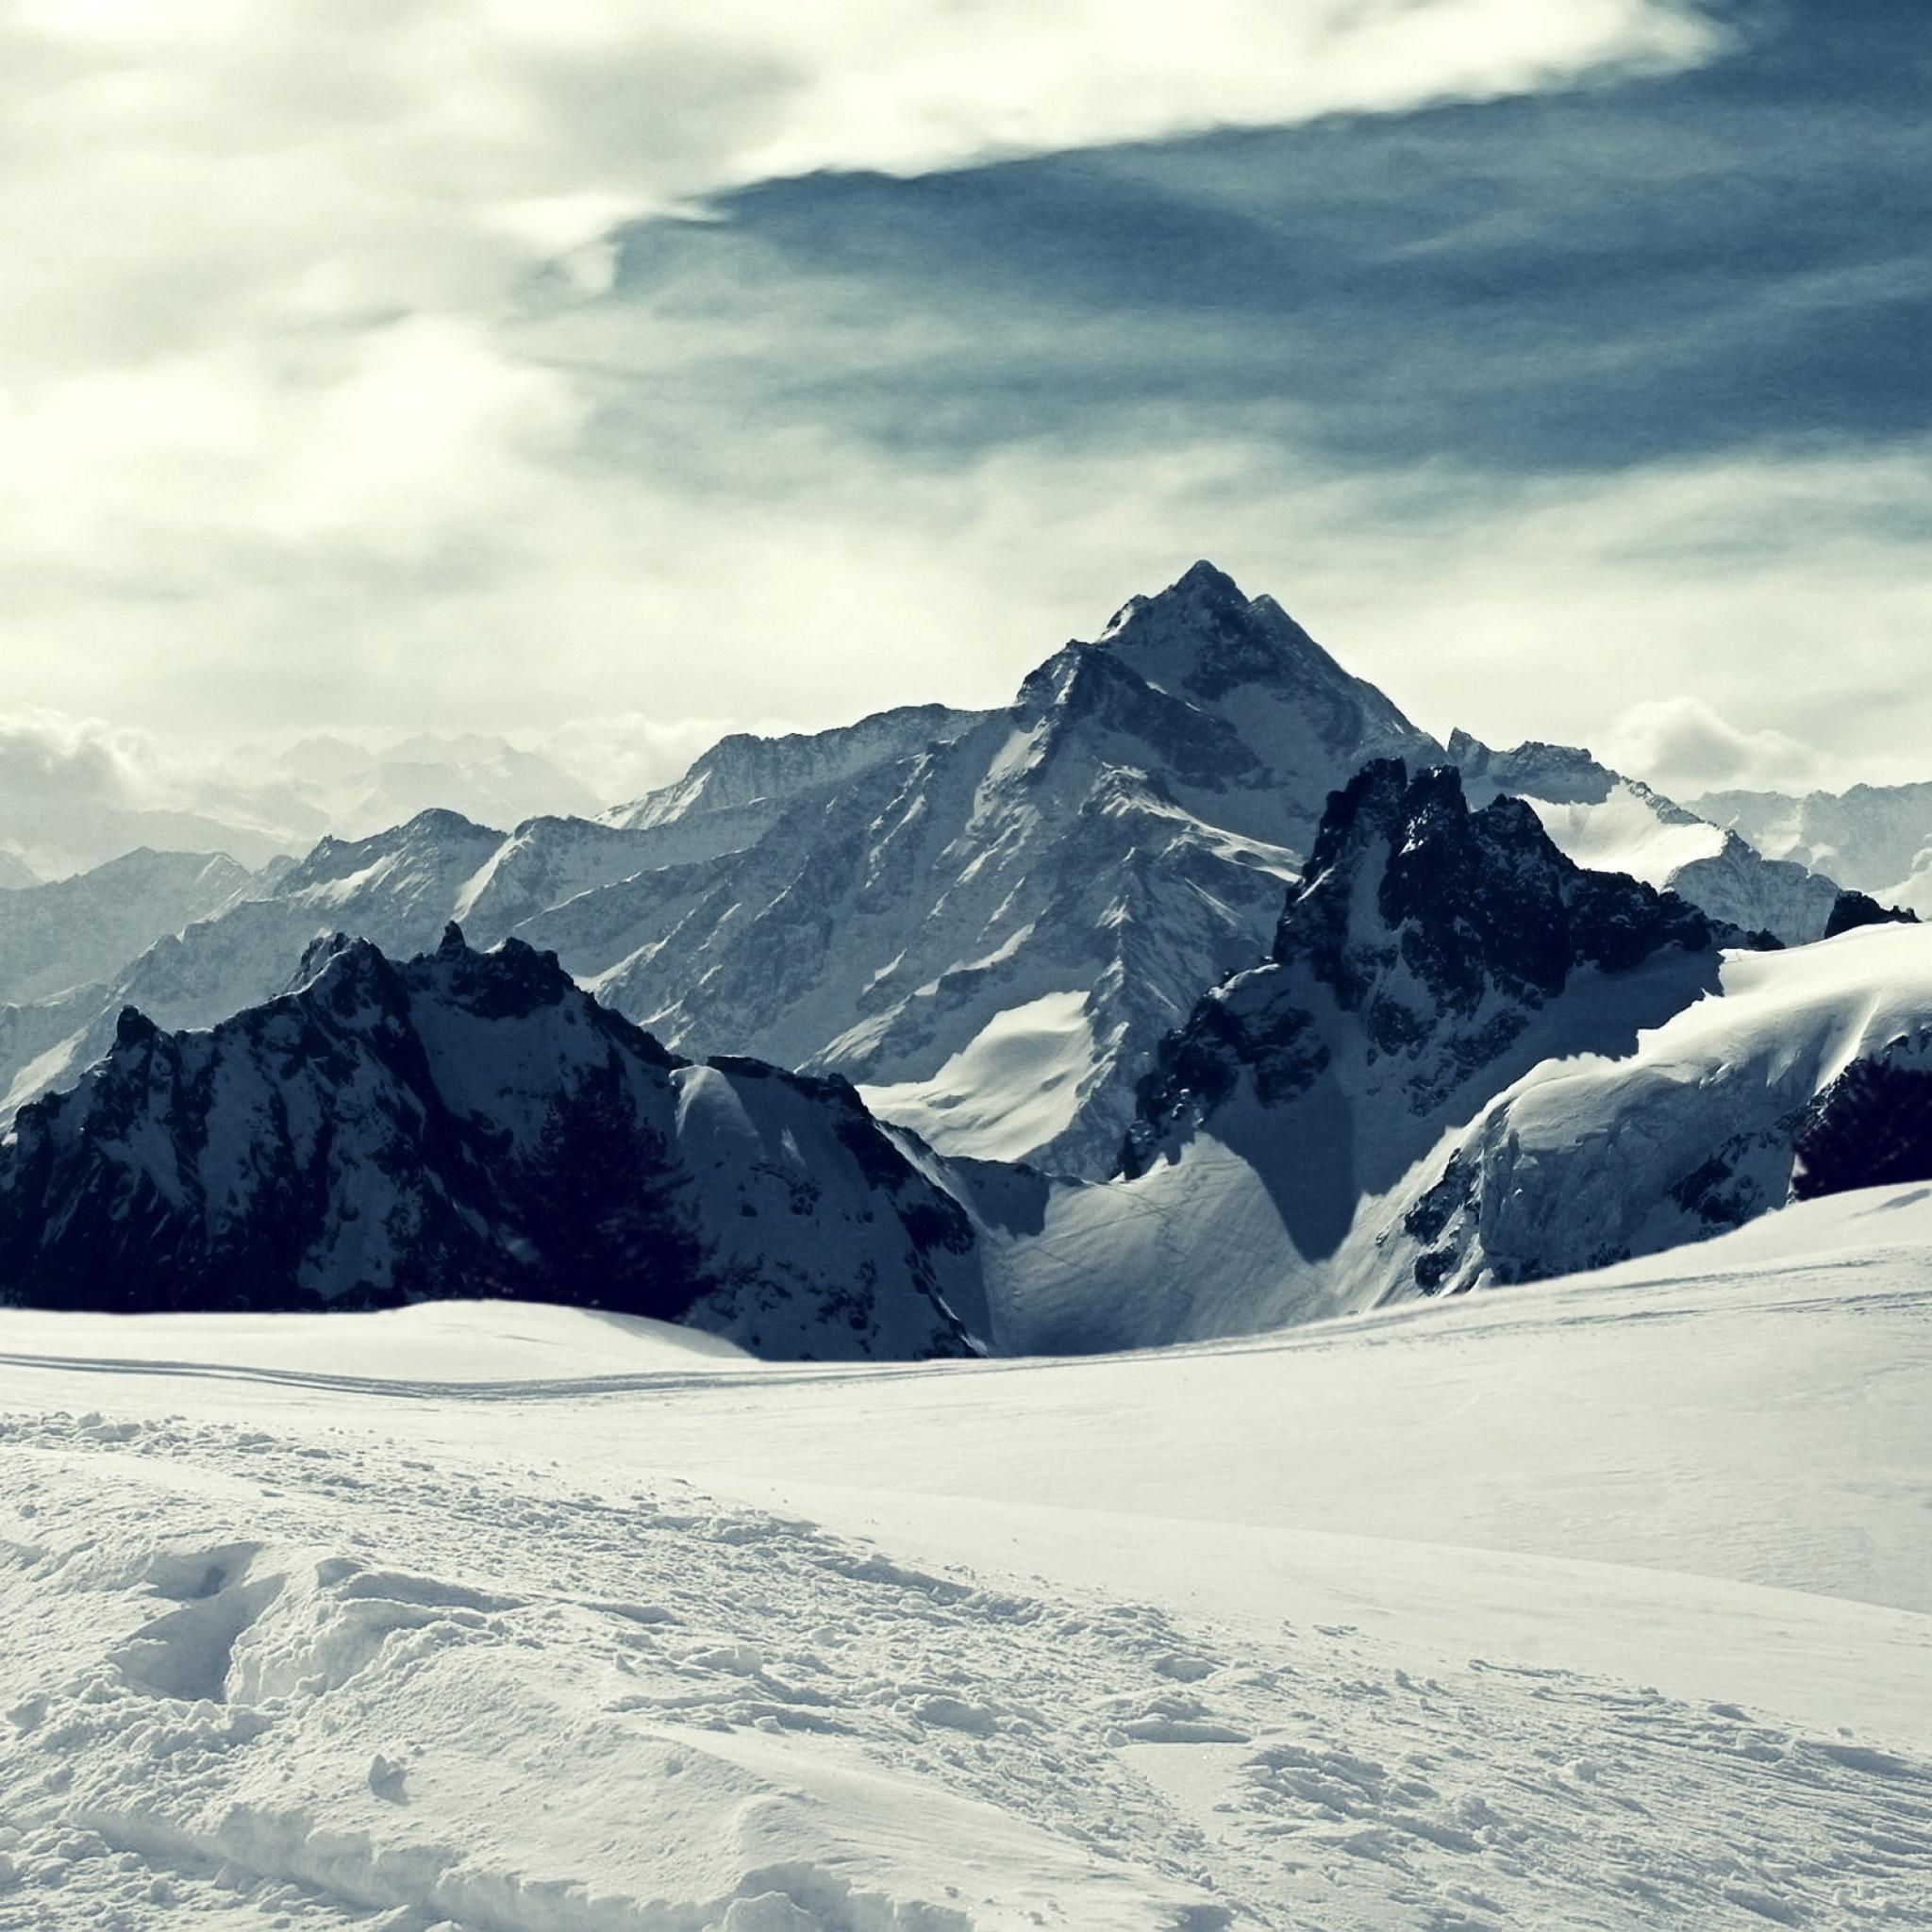 Mount Hd Wallpaper: Mount Everest Wallpaper HD (60+ Images